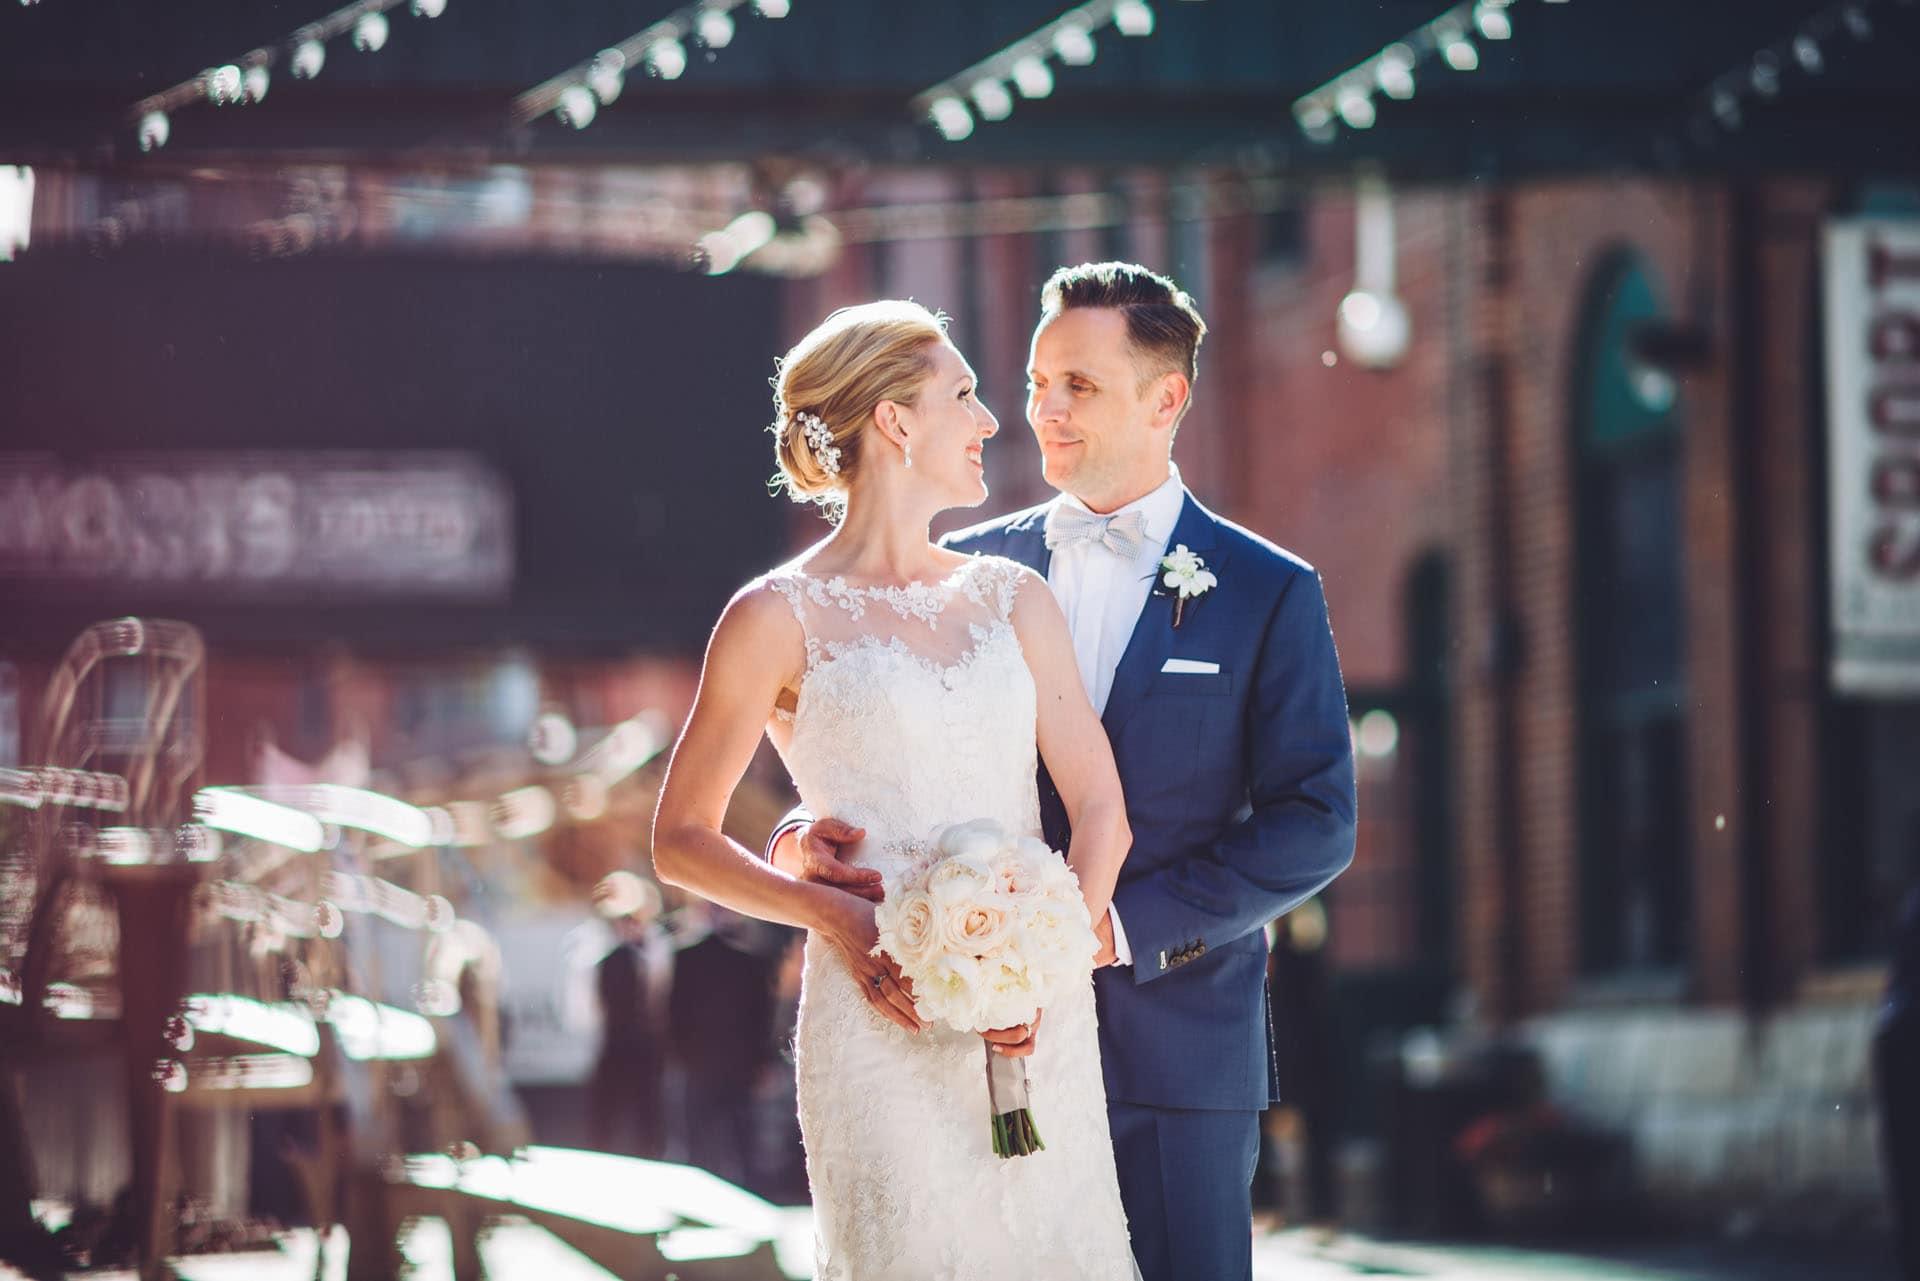 Arta Gallery Wedding | Toronto Wedding Studios | Artistic Photography | Creative Wedding Photographer